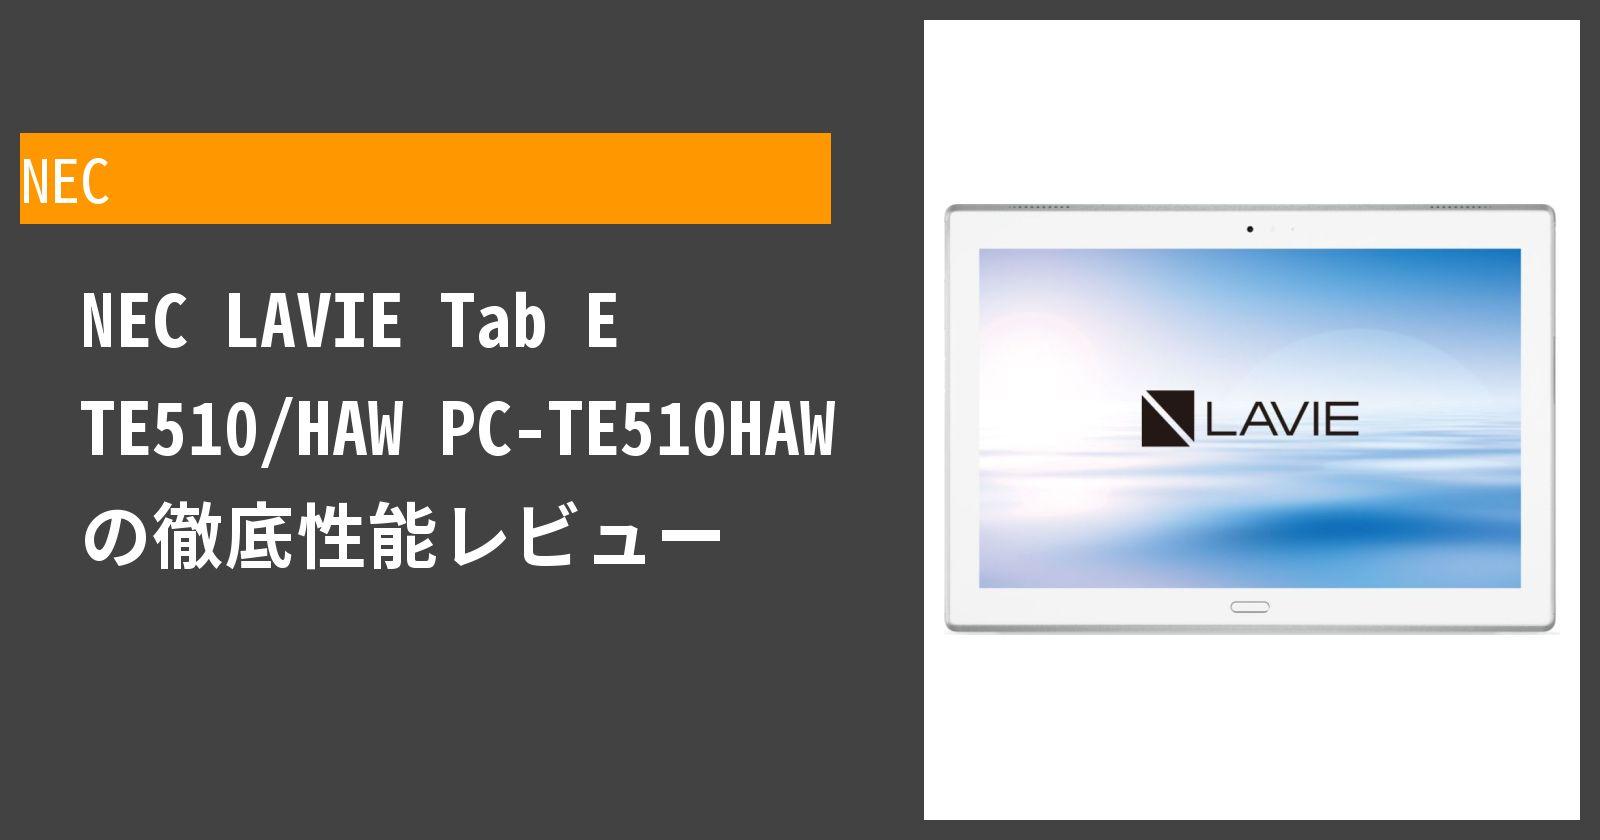 LAVIE Tab E TE510/HAW PC-TE510HAW の徹底性能レビュー